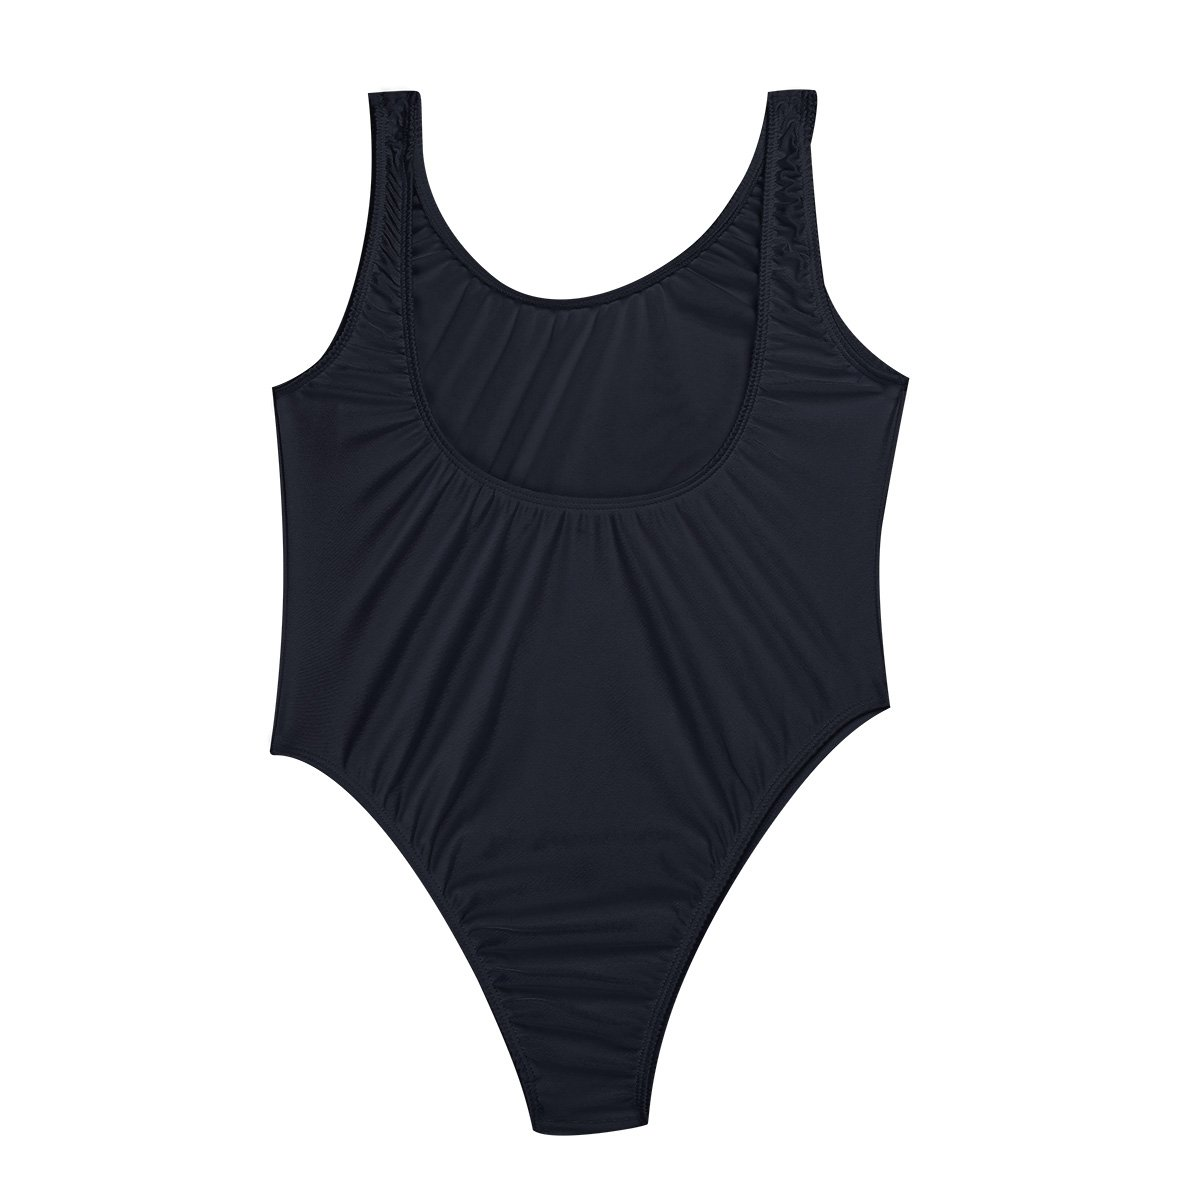 193f4639cf Freebily Women One Piece Bodysuit High Cut Swimsuit Thong Gymnastics  Bodysuit Leotard Bikini Black One Size at Amazon Women s Clothing store